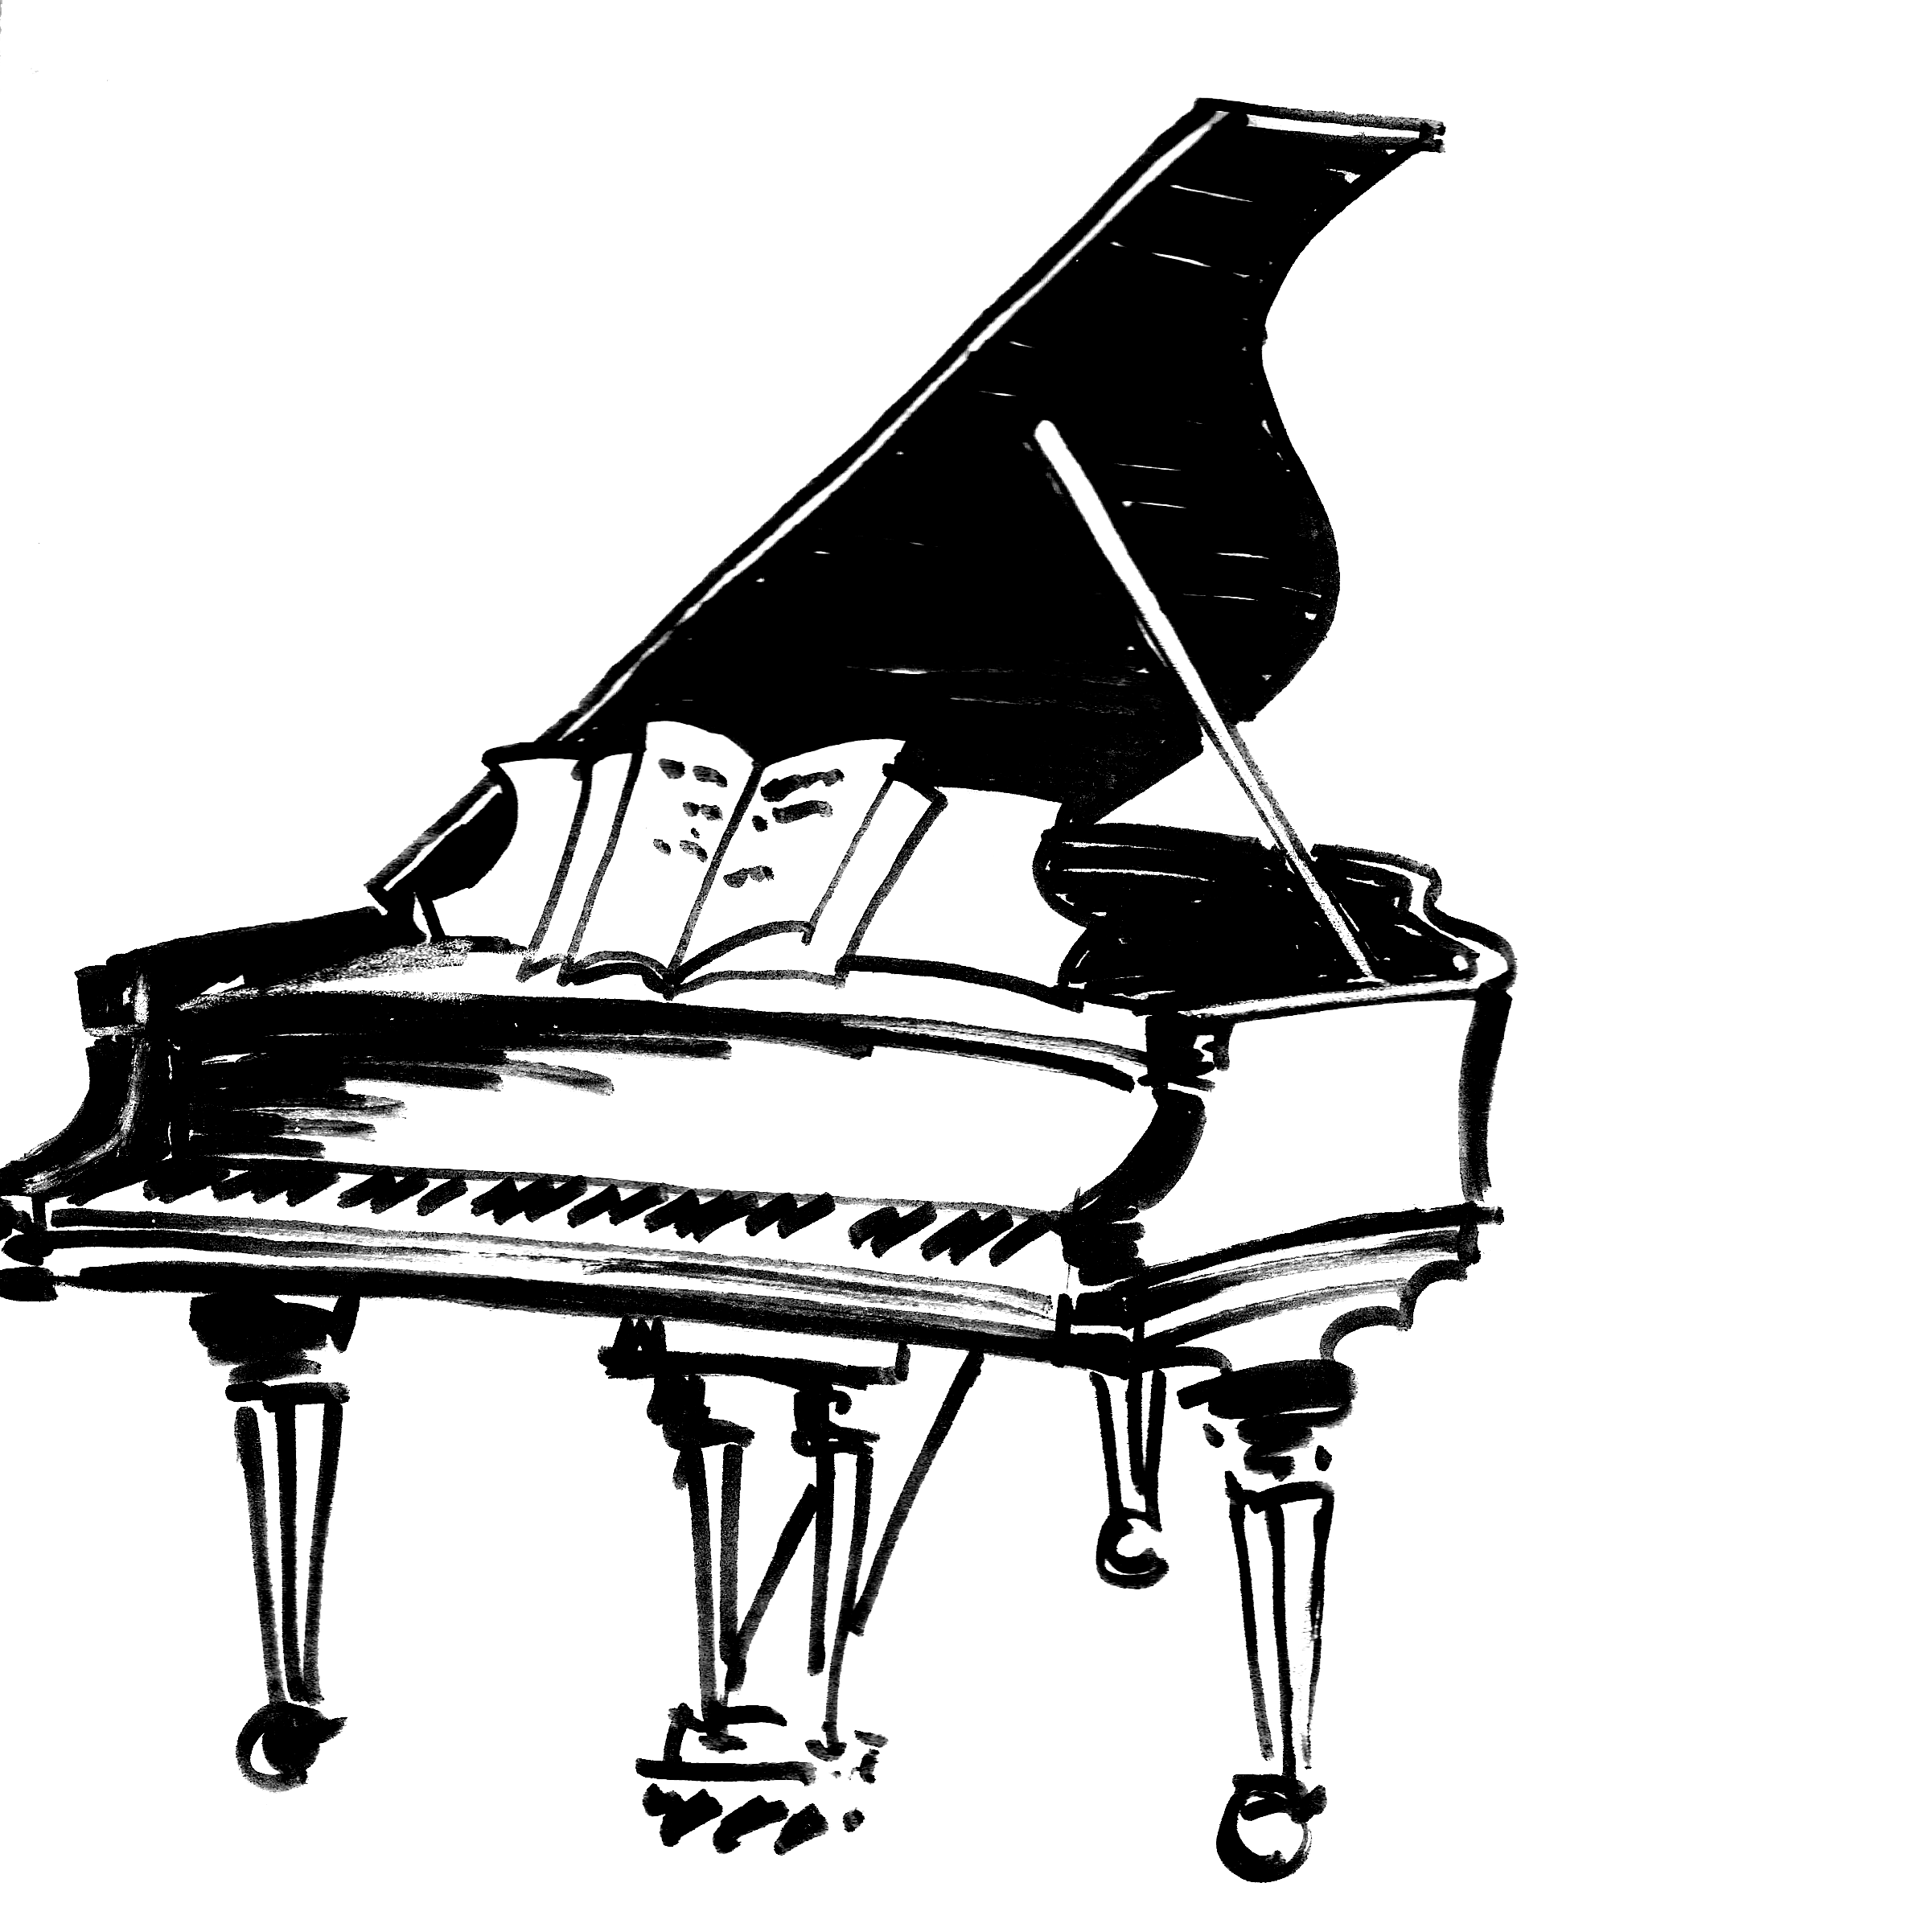 svg transparent library Wavy piano keyboard clipart. Drawing at getdrawings com